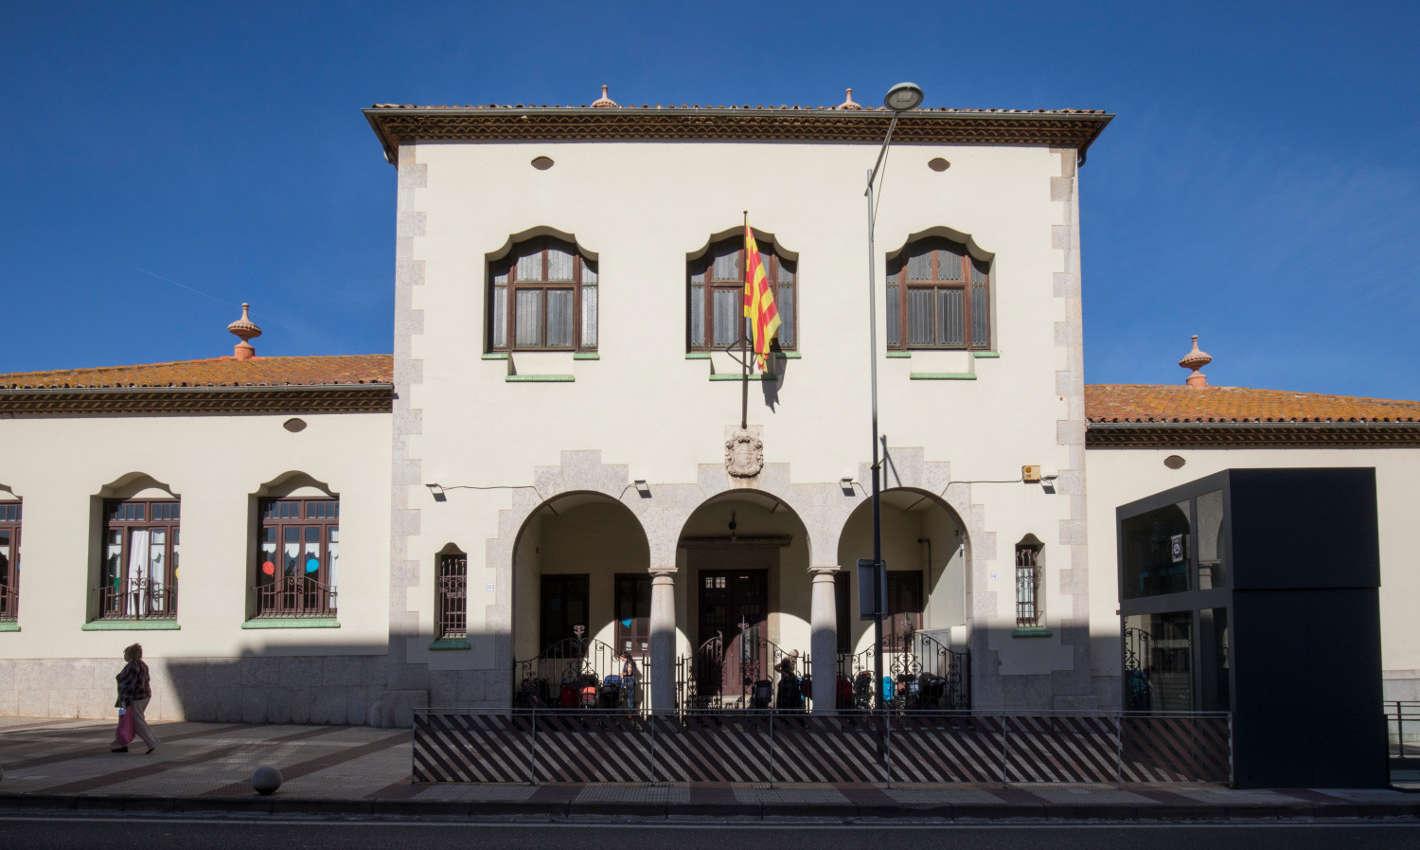 Edifici noucentista Biblioteca Costa i Fornaguera